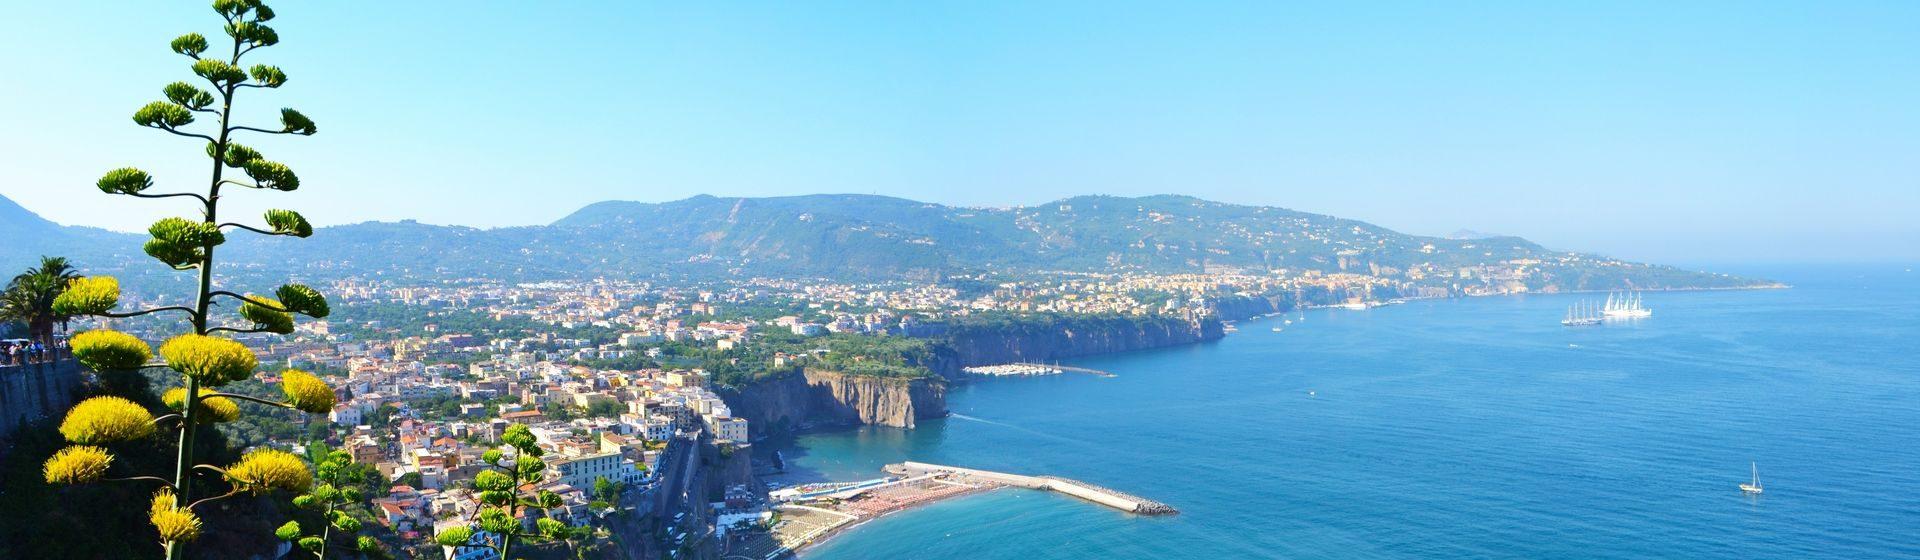 Drivinaples Sorrento Amalfi Coast  Tour Shore Excurision